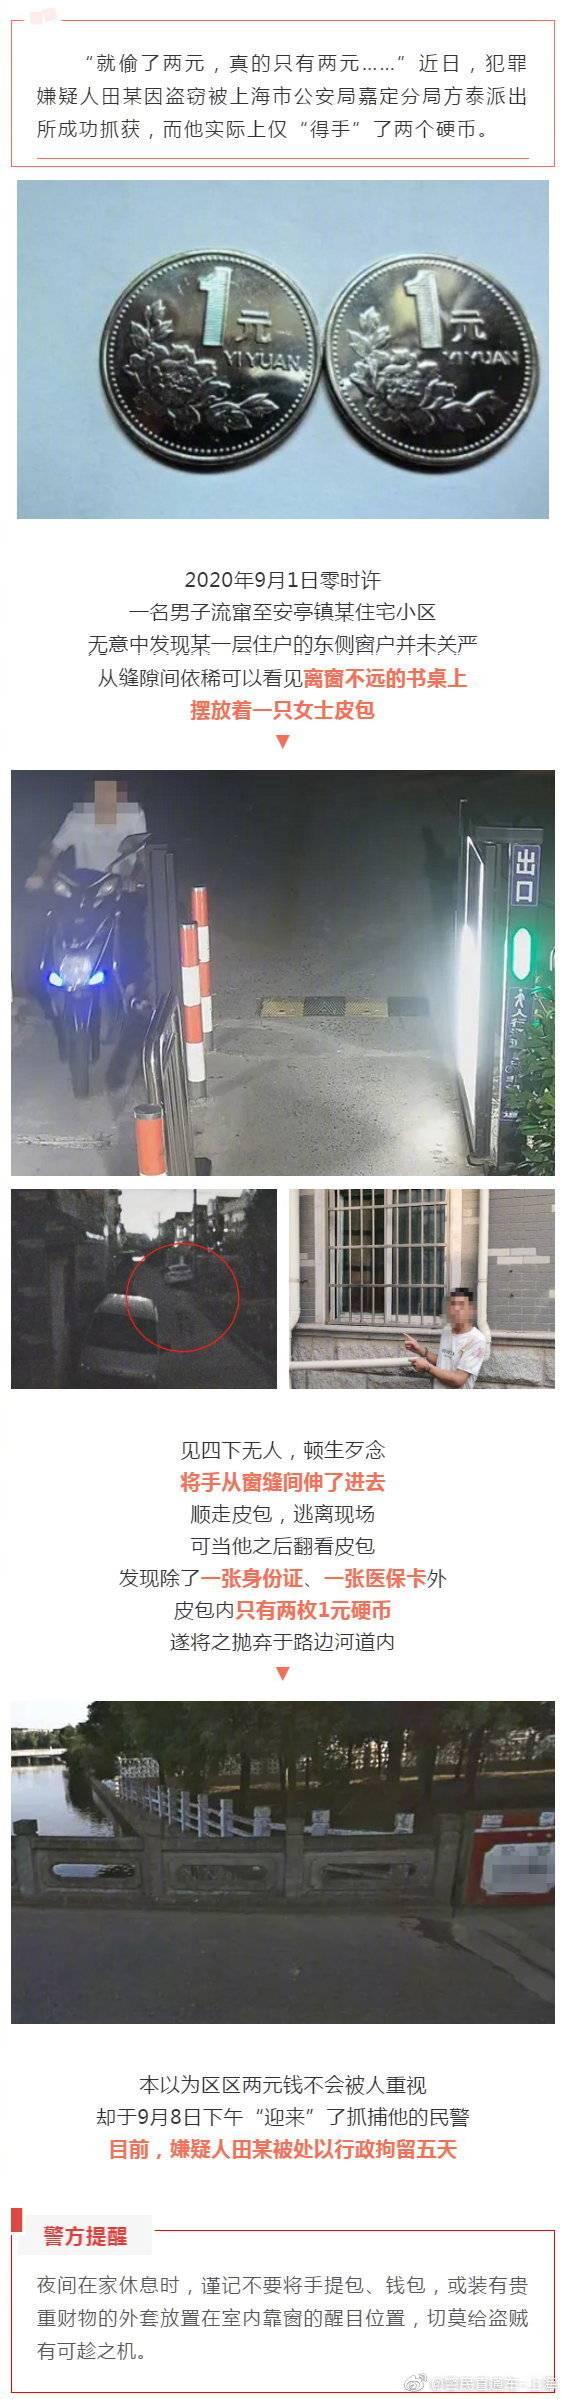 <strong>上海公安执法实录 【就偷两元? 马克吐</strong>